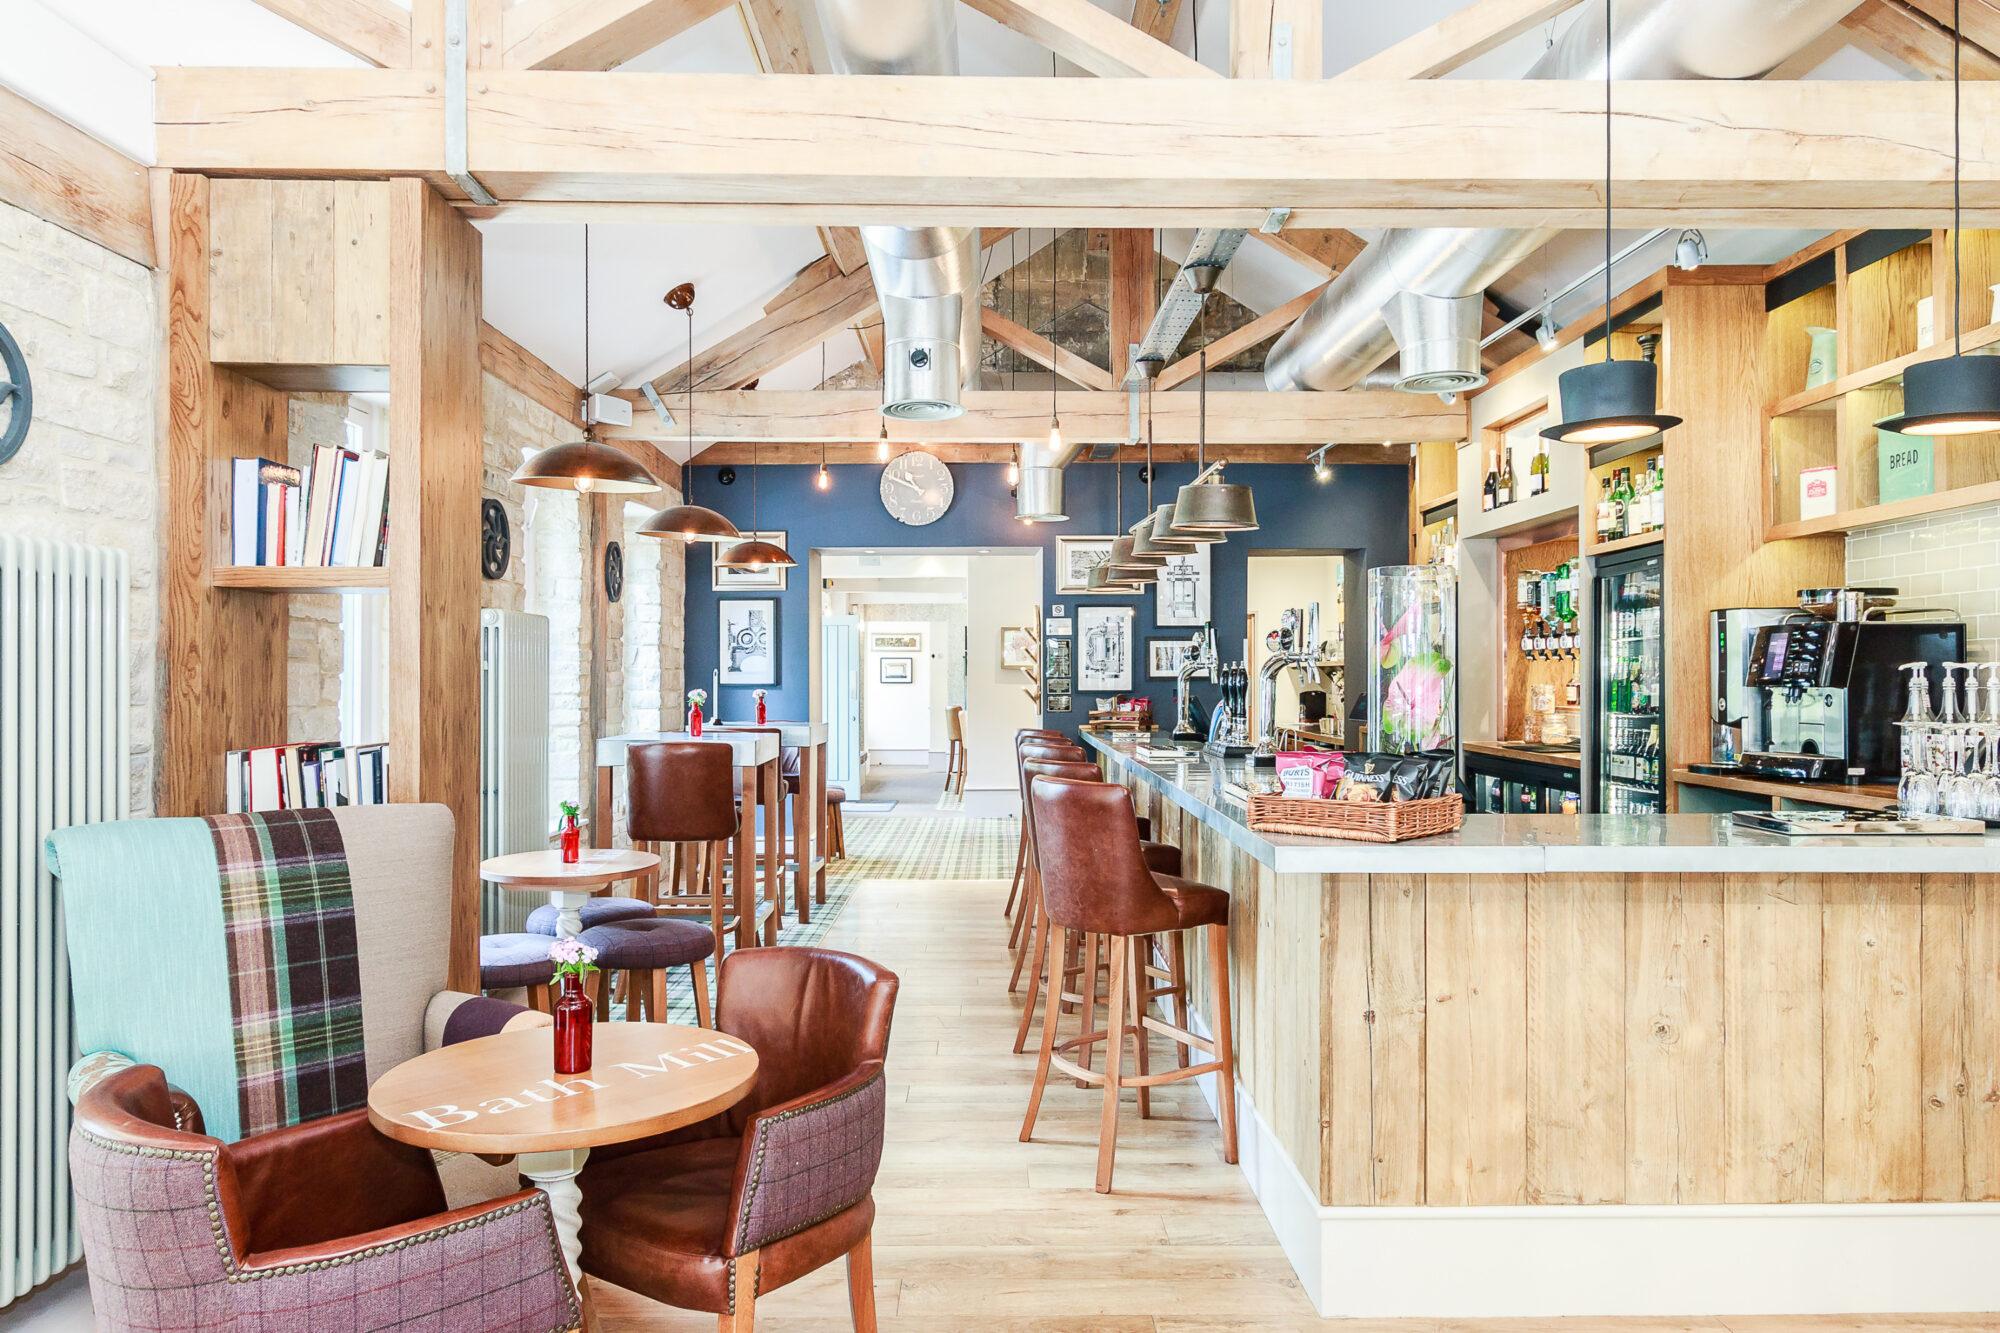 Interior shot of the Brook Bar & Bistro